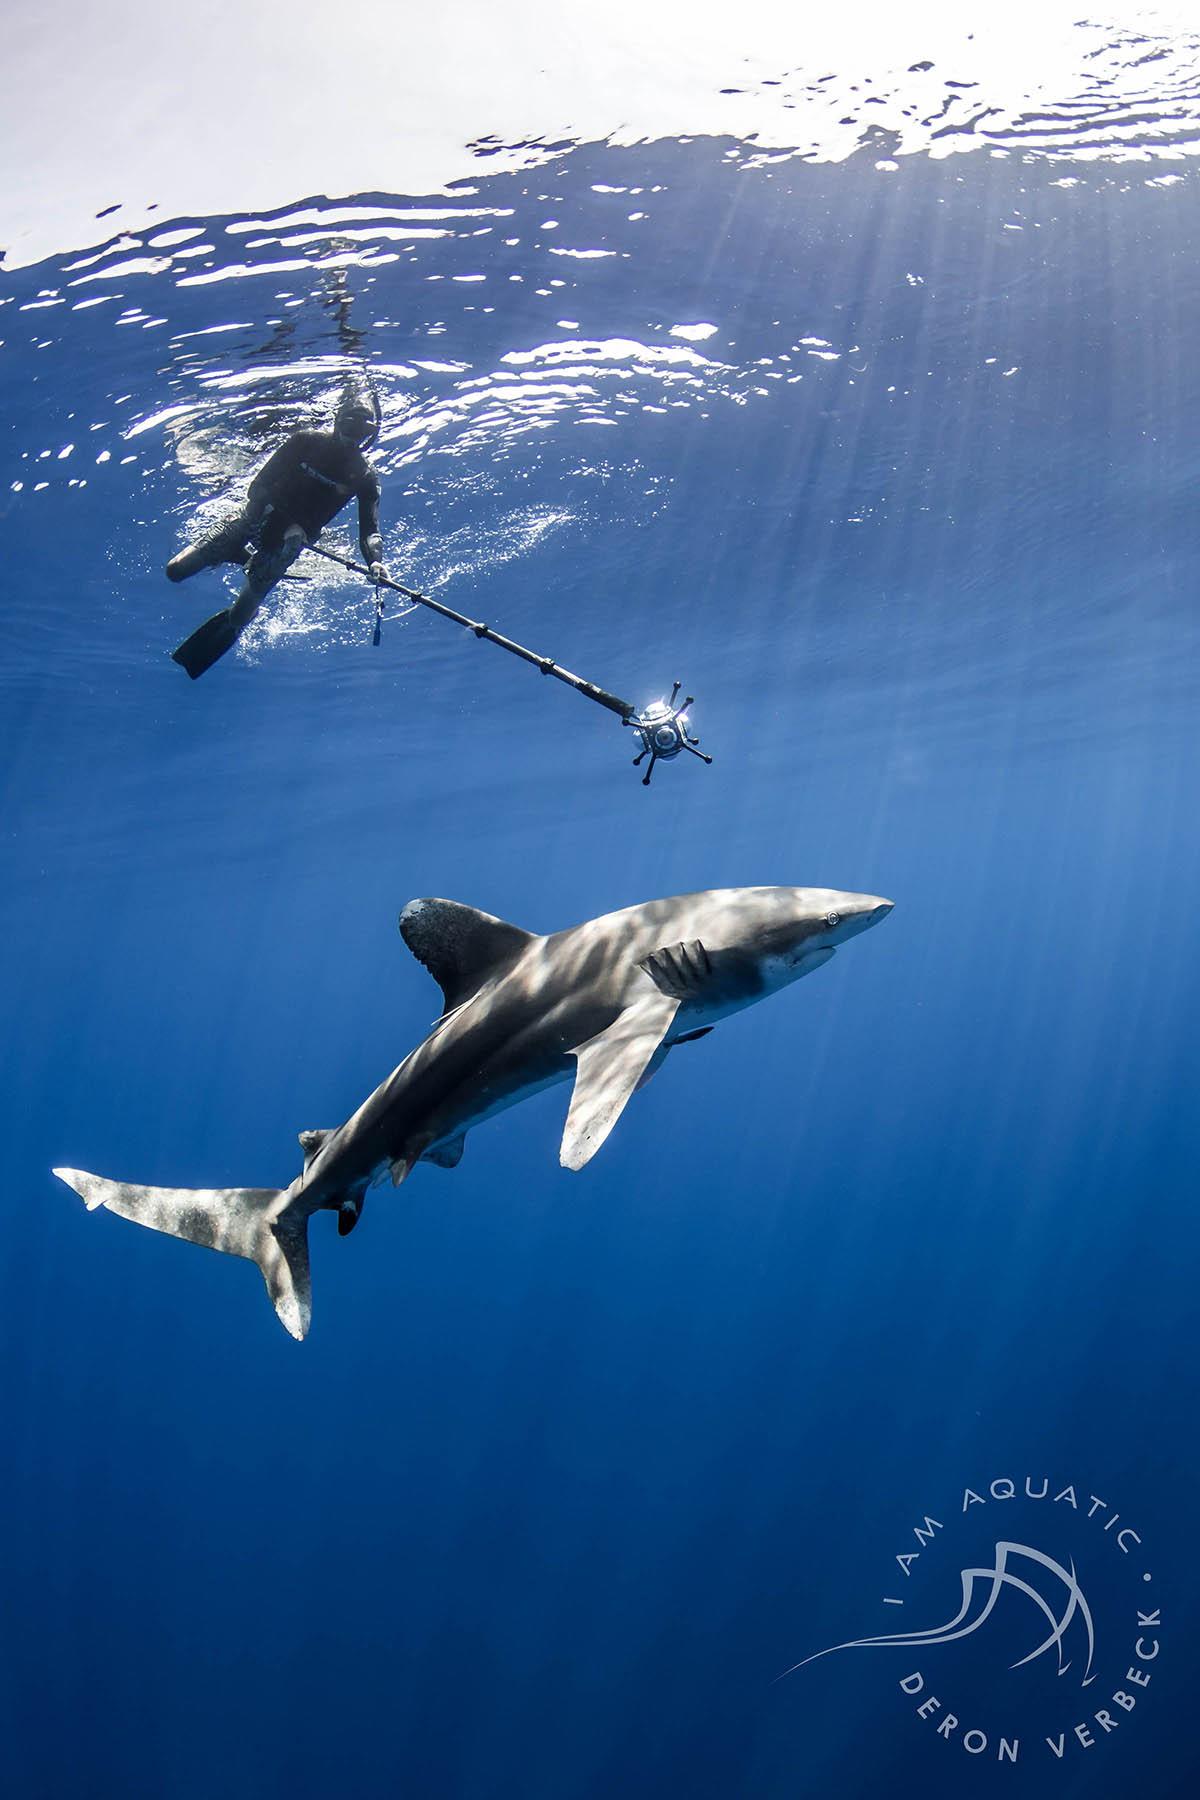 tom-with-shark-small-version.jpg